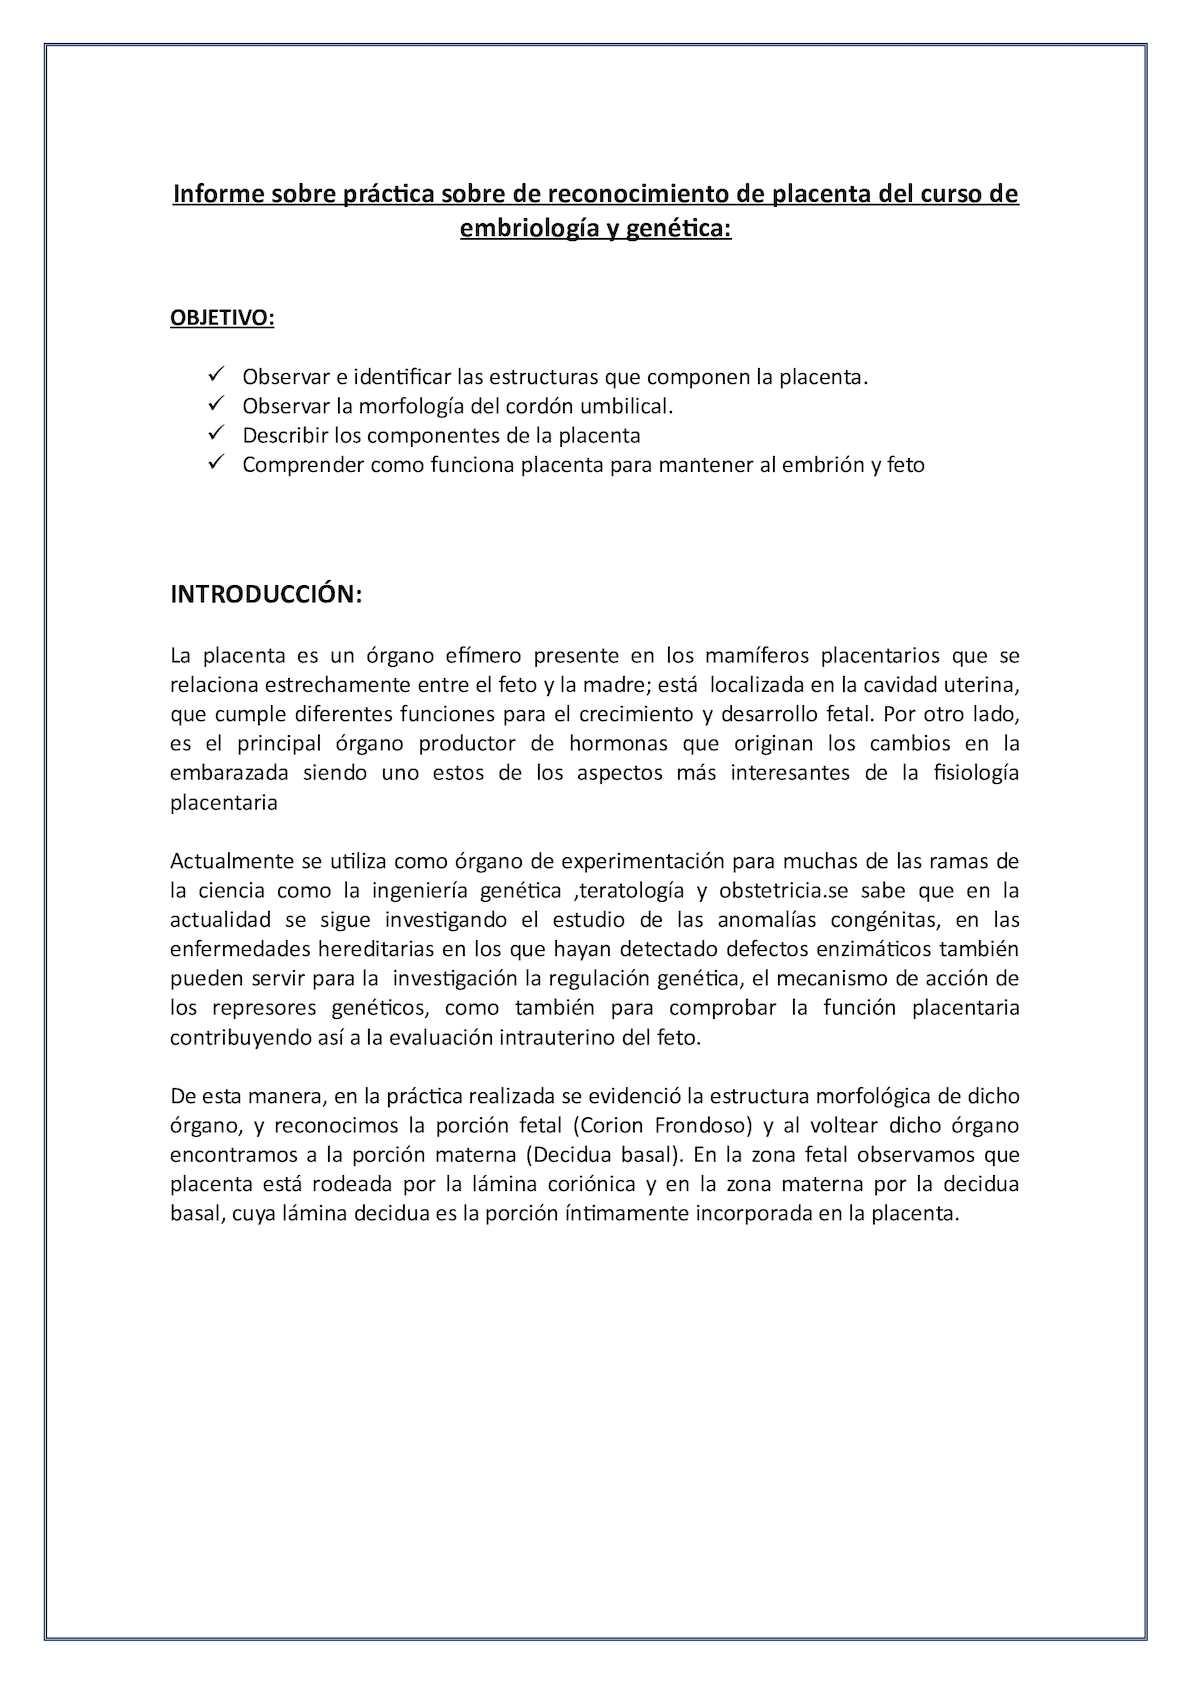 Informe Placenta 2015 Calameo Downloader